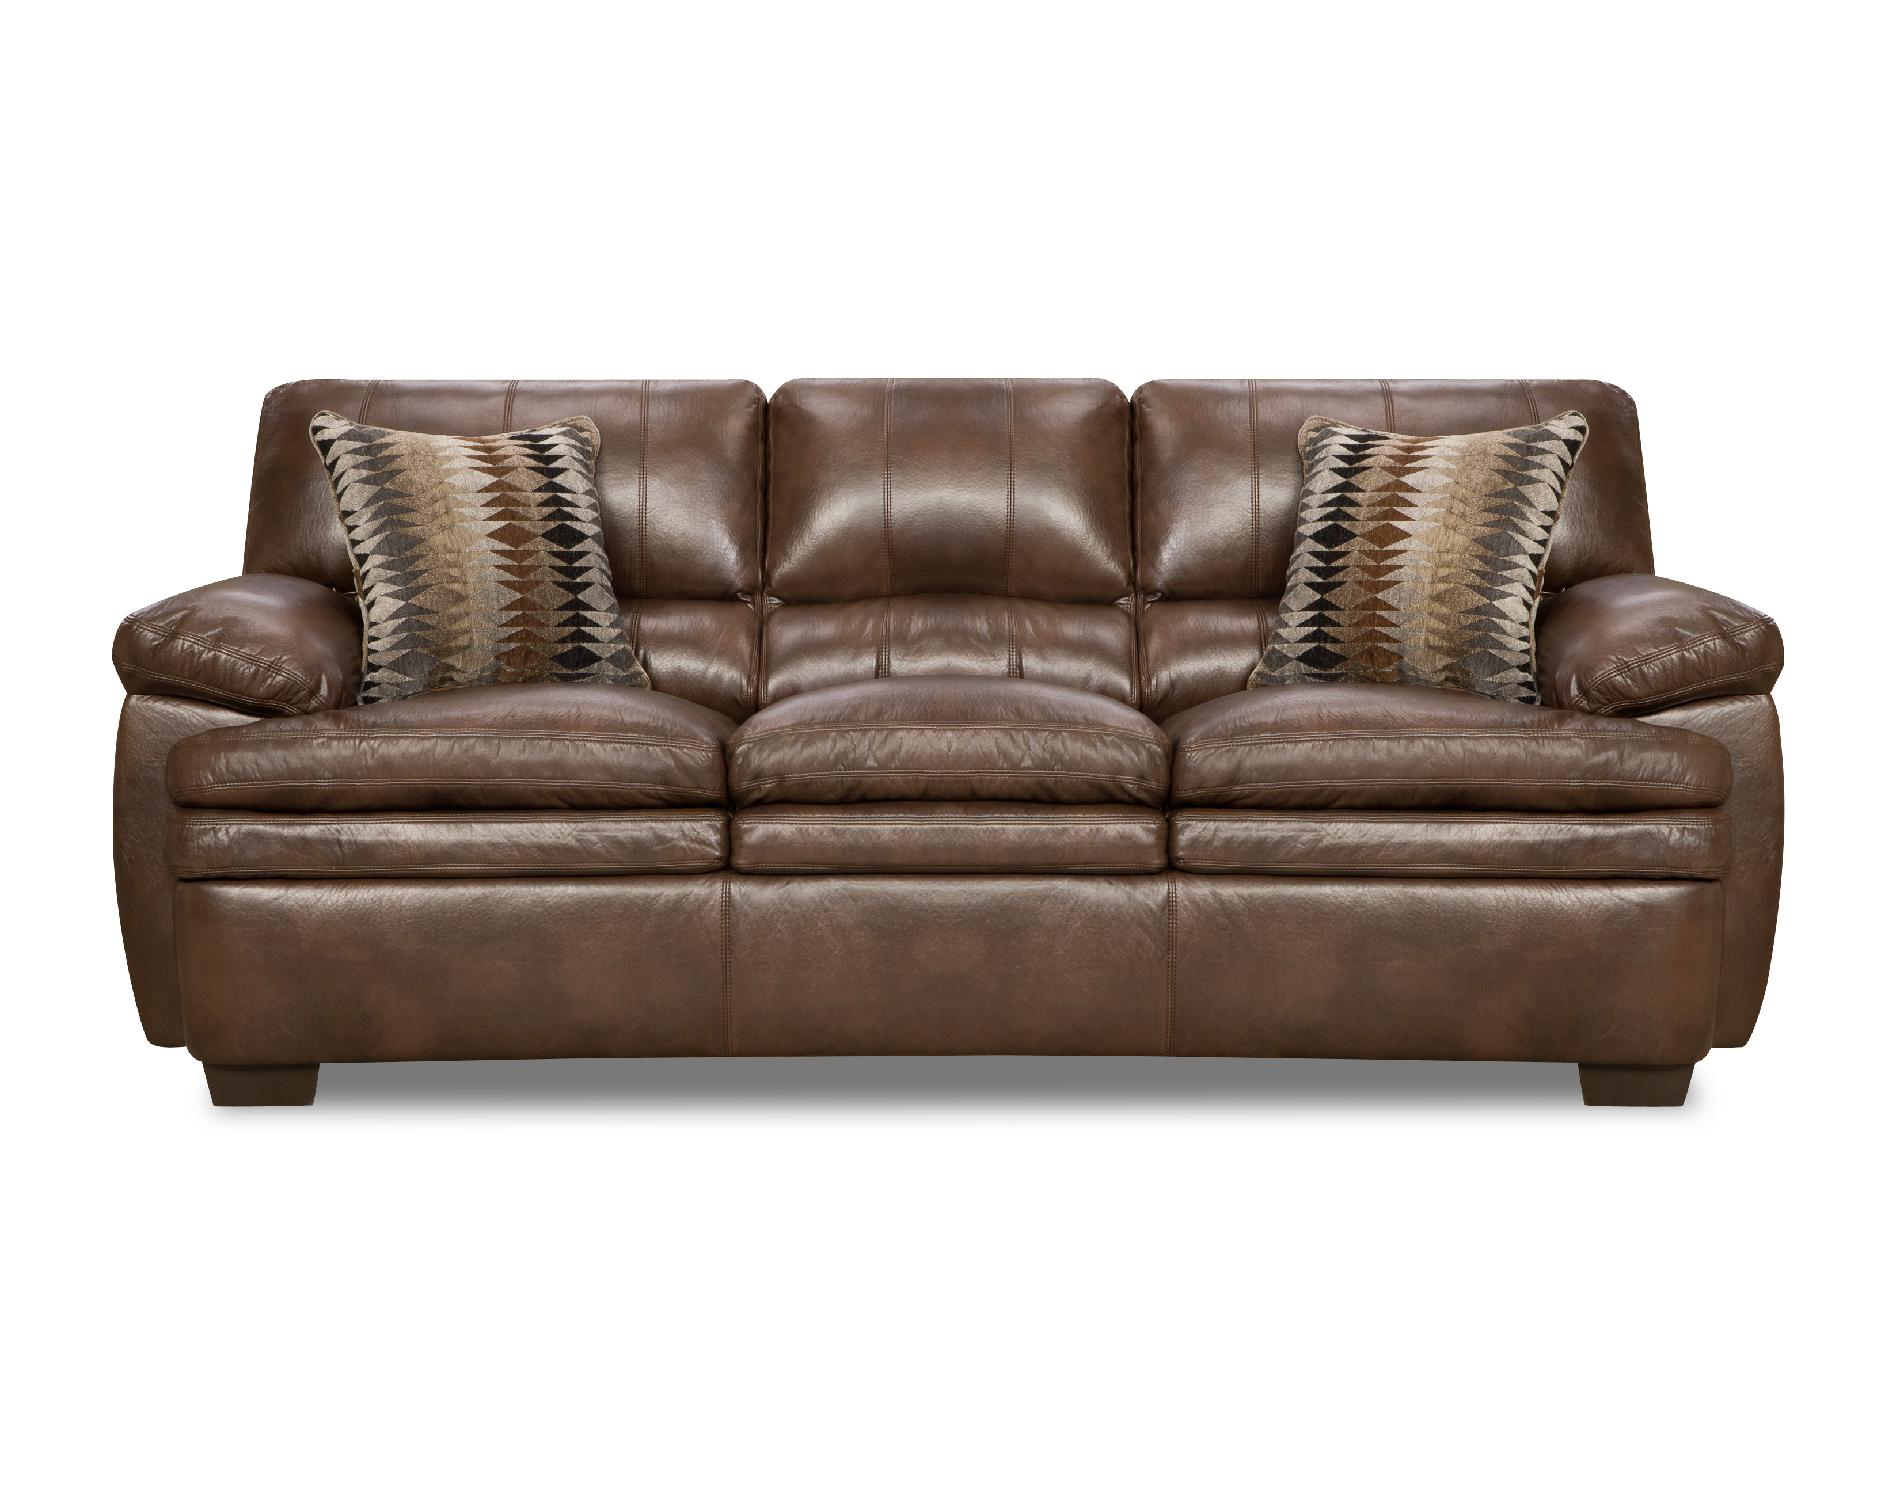 Simmons Three Cushion Split Back Editor Arm Sofa Sears